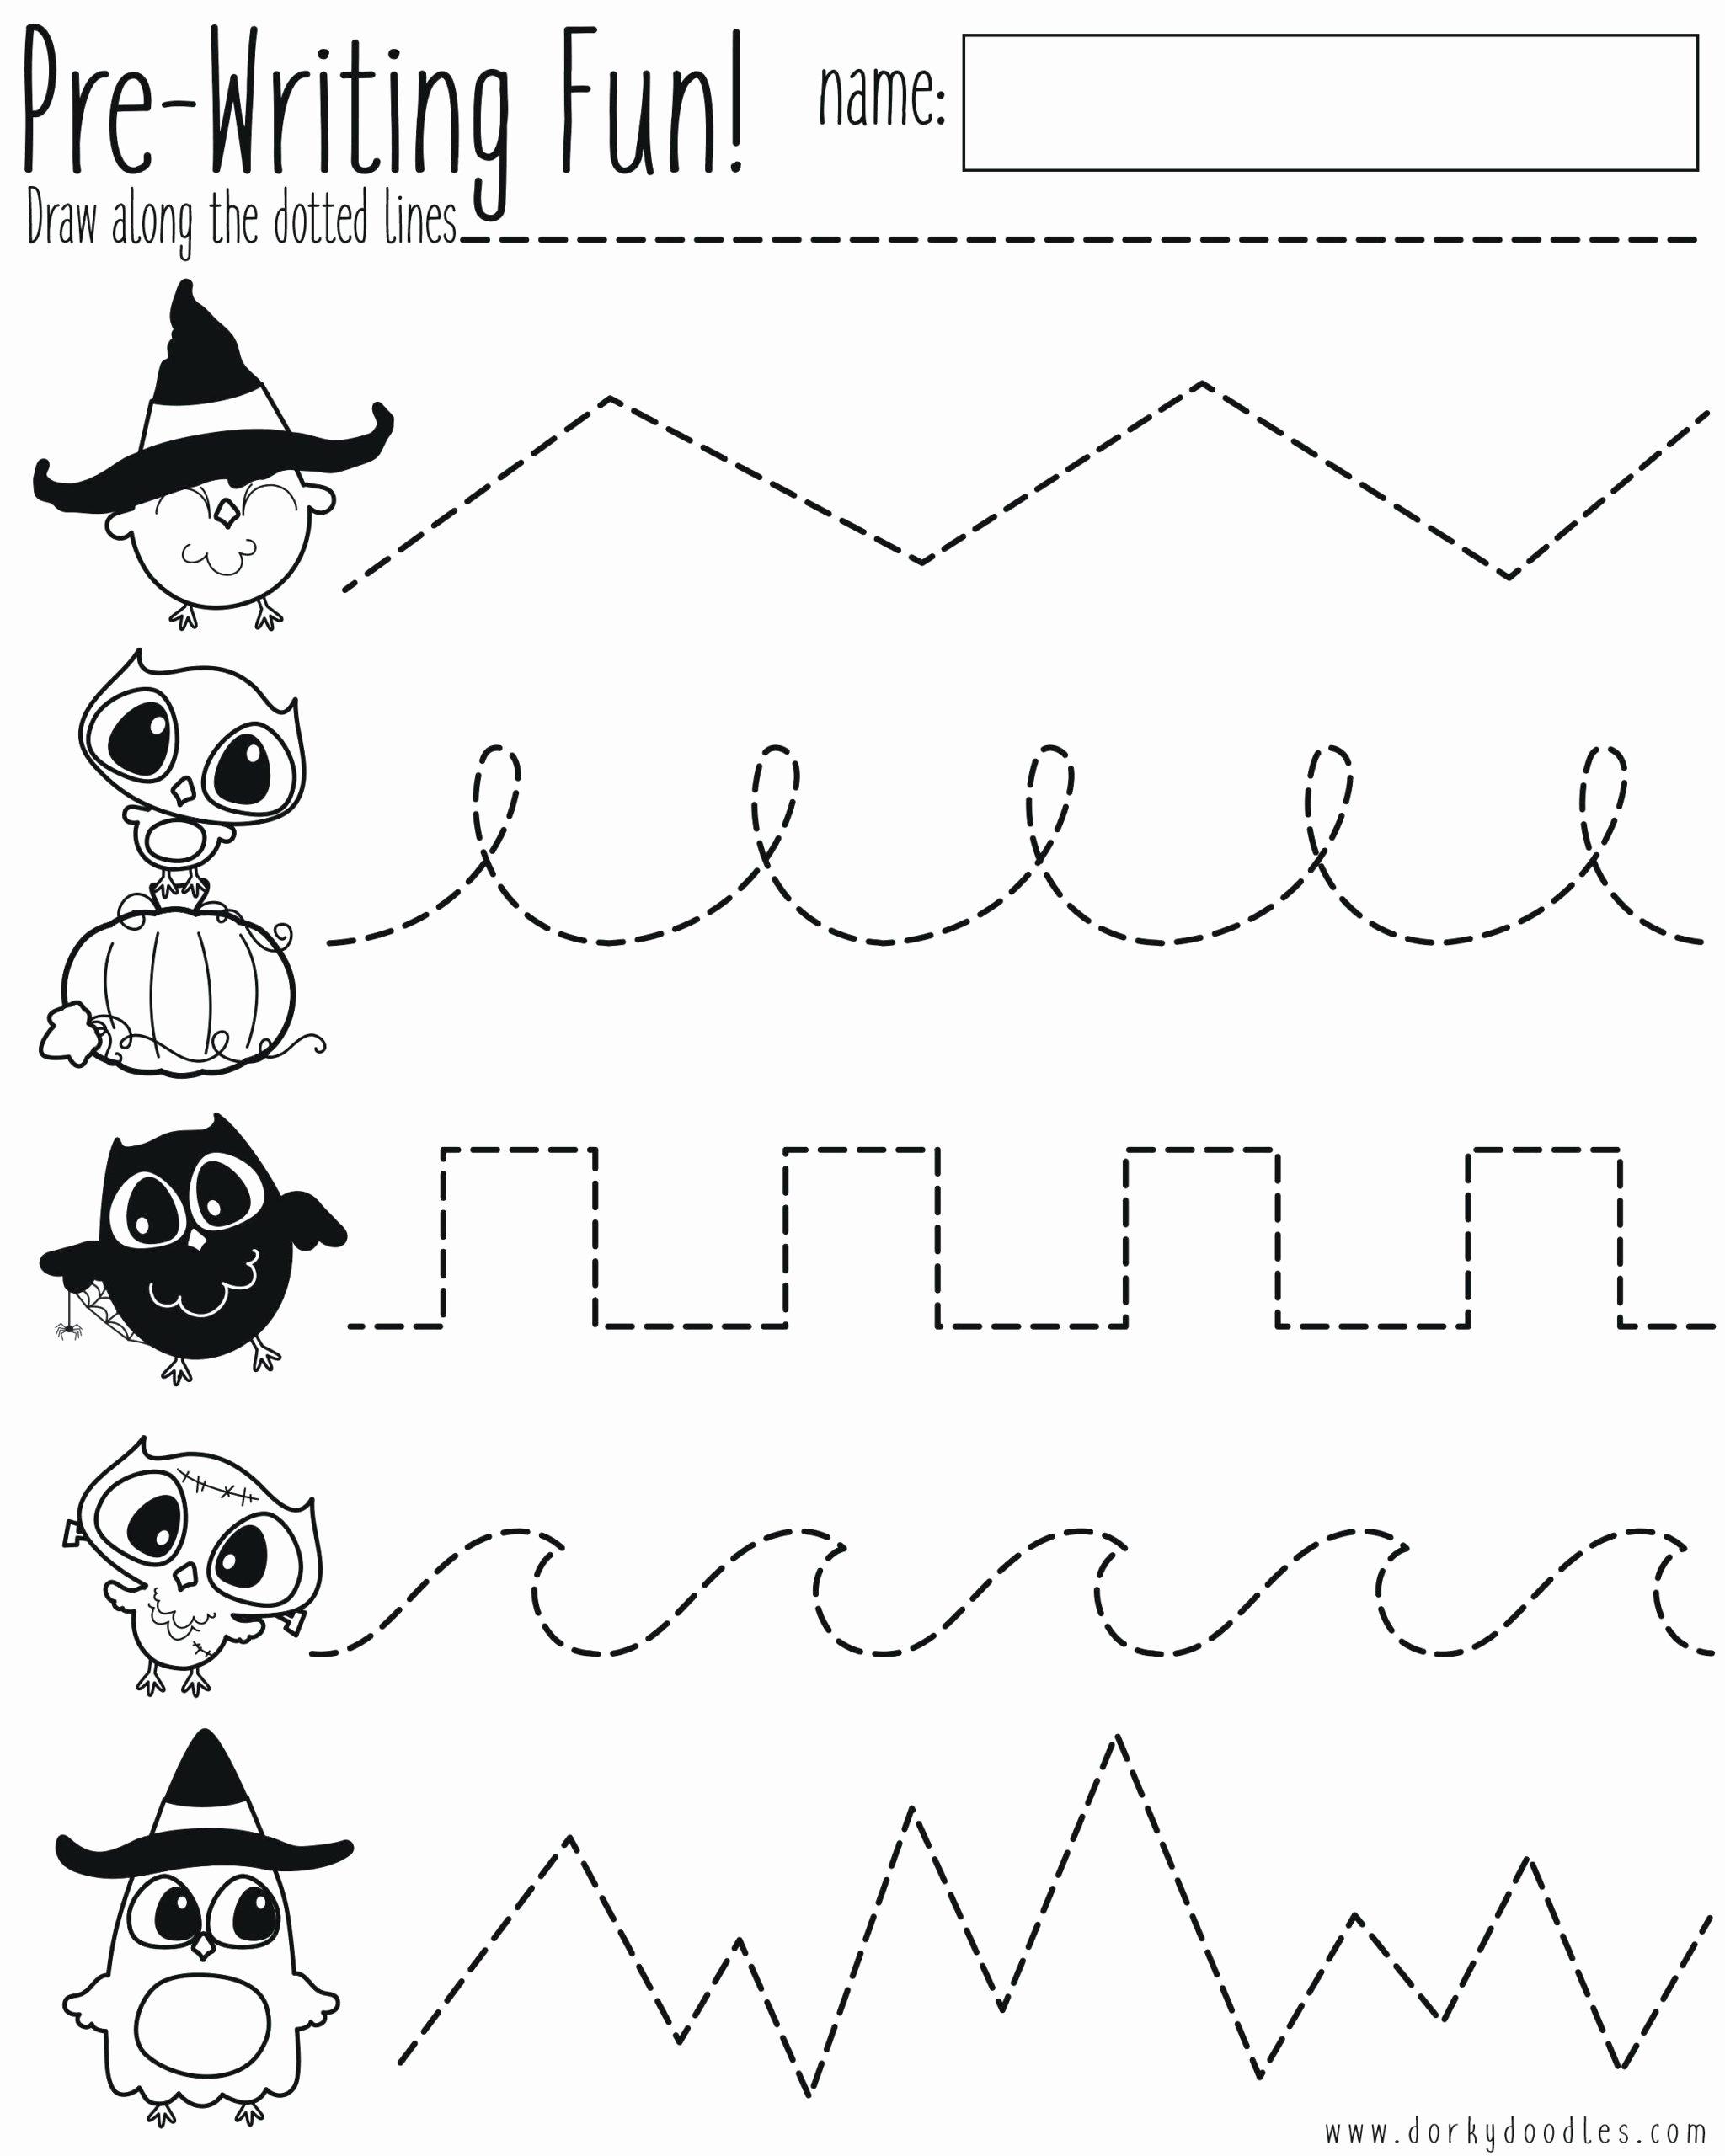 Worksheets for Preschoolers Writing top Math Worksheet 46 Outstanding Printable Writing Worksheets